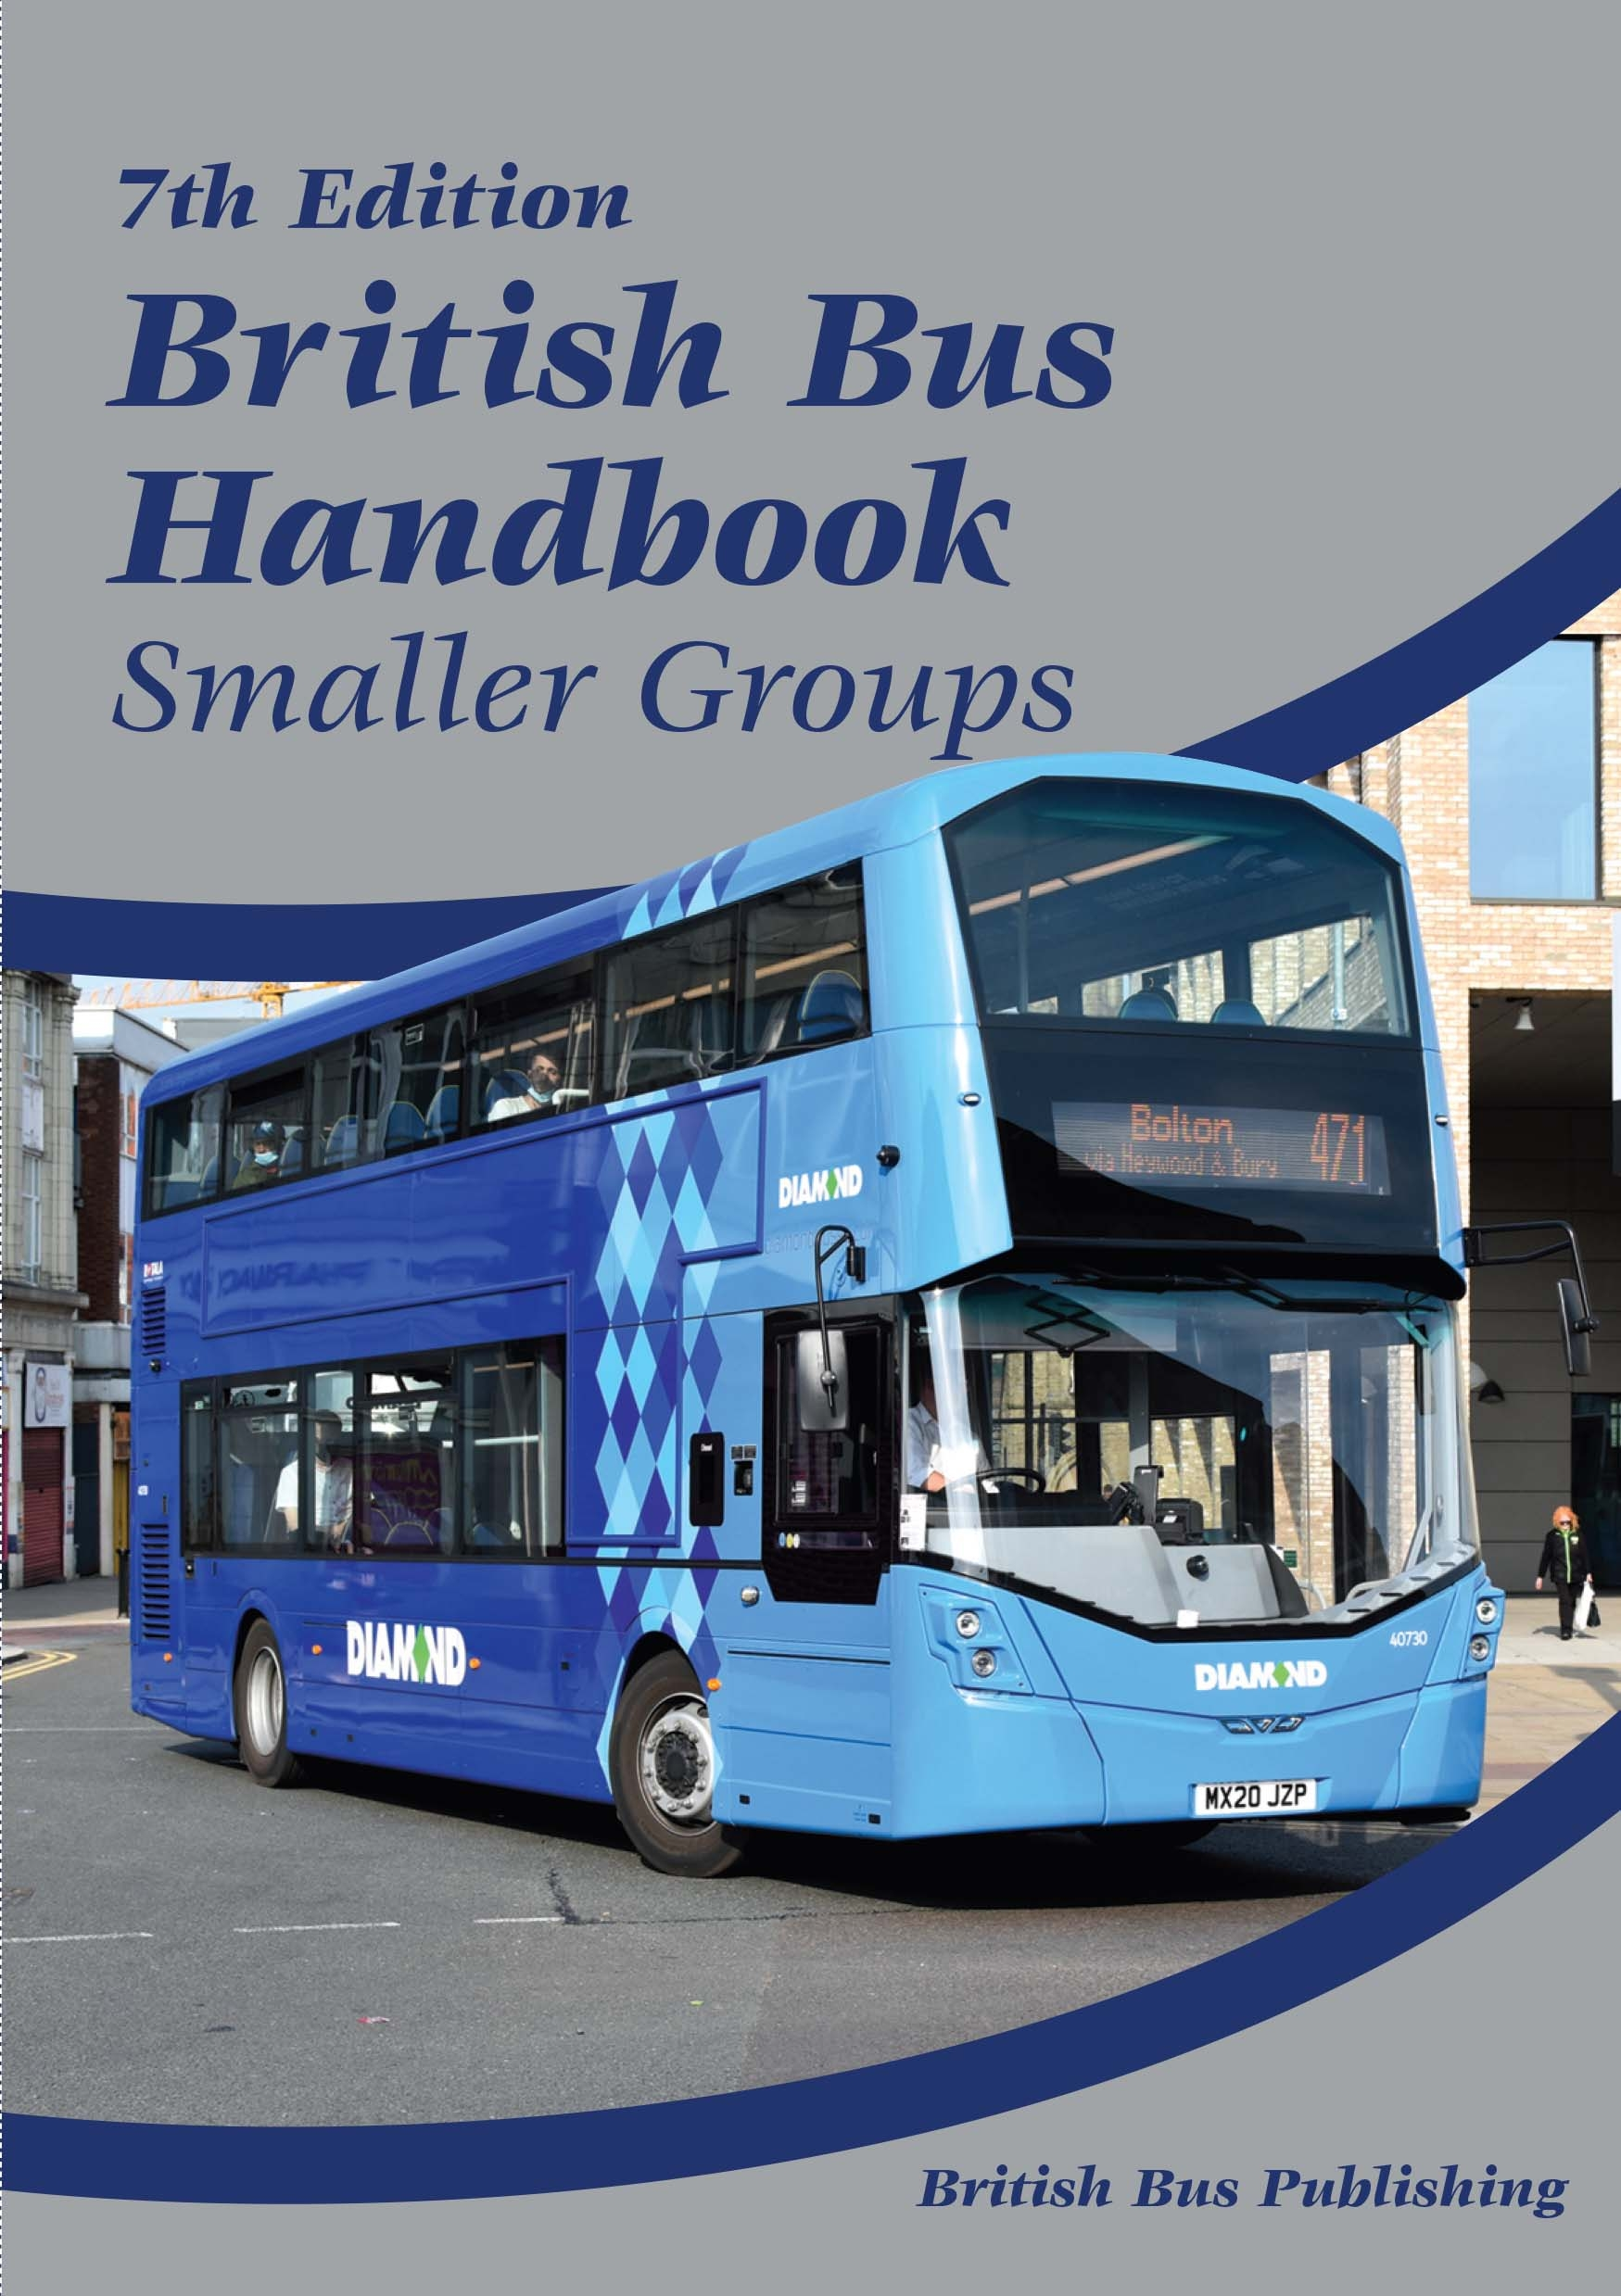 English Bus Handbooks